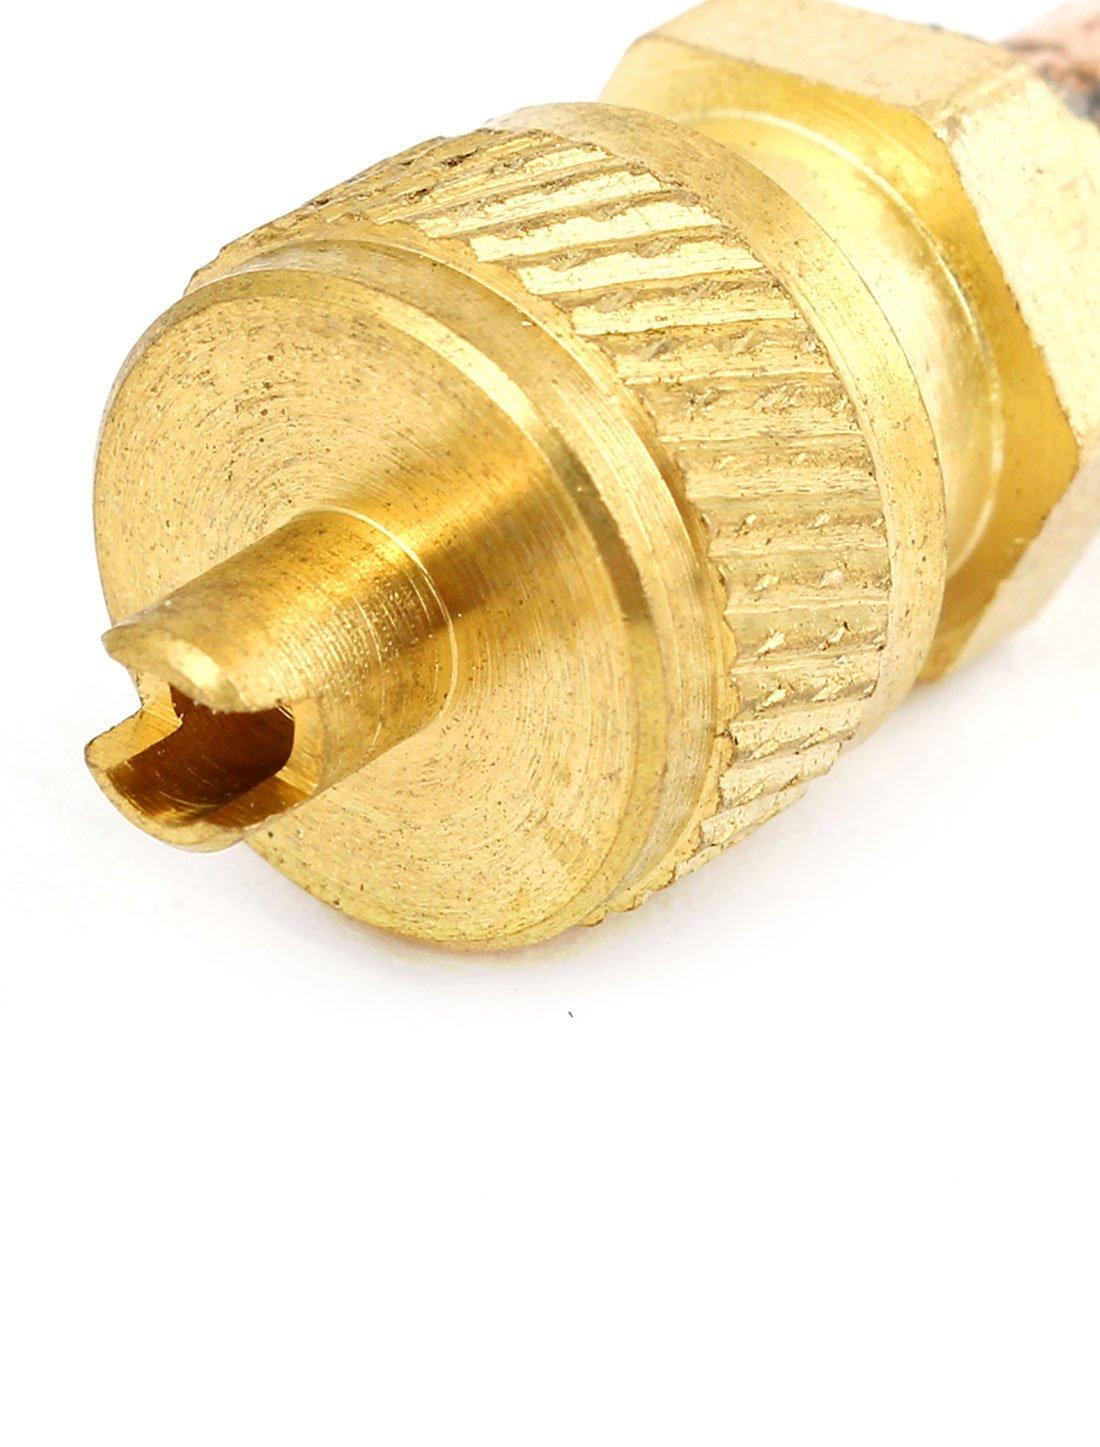 5 mm OD Tubo de aire del refrigerador de acceso a la v/álvula tono de cobre